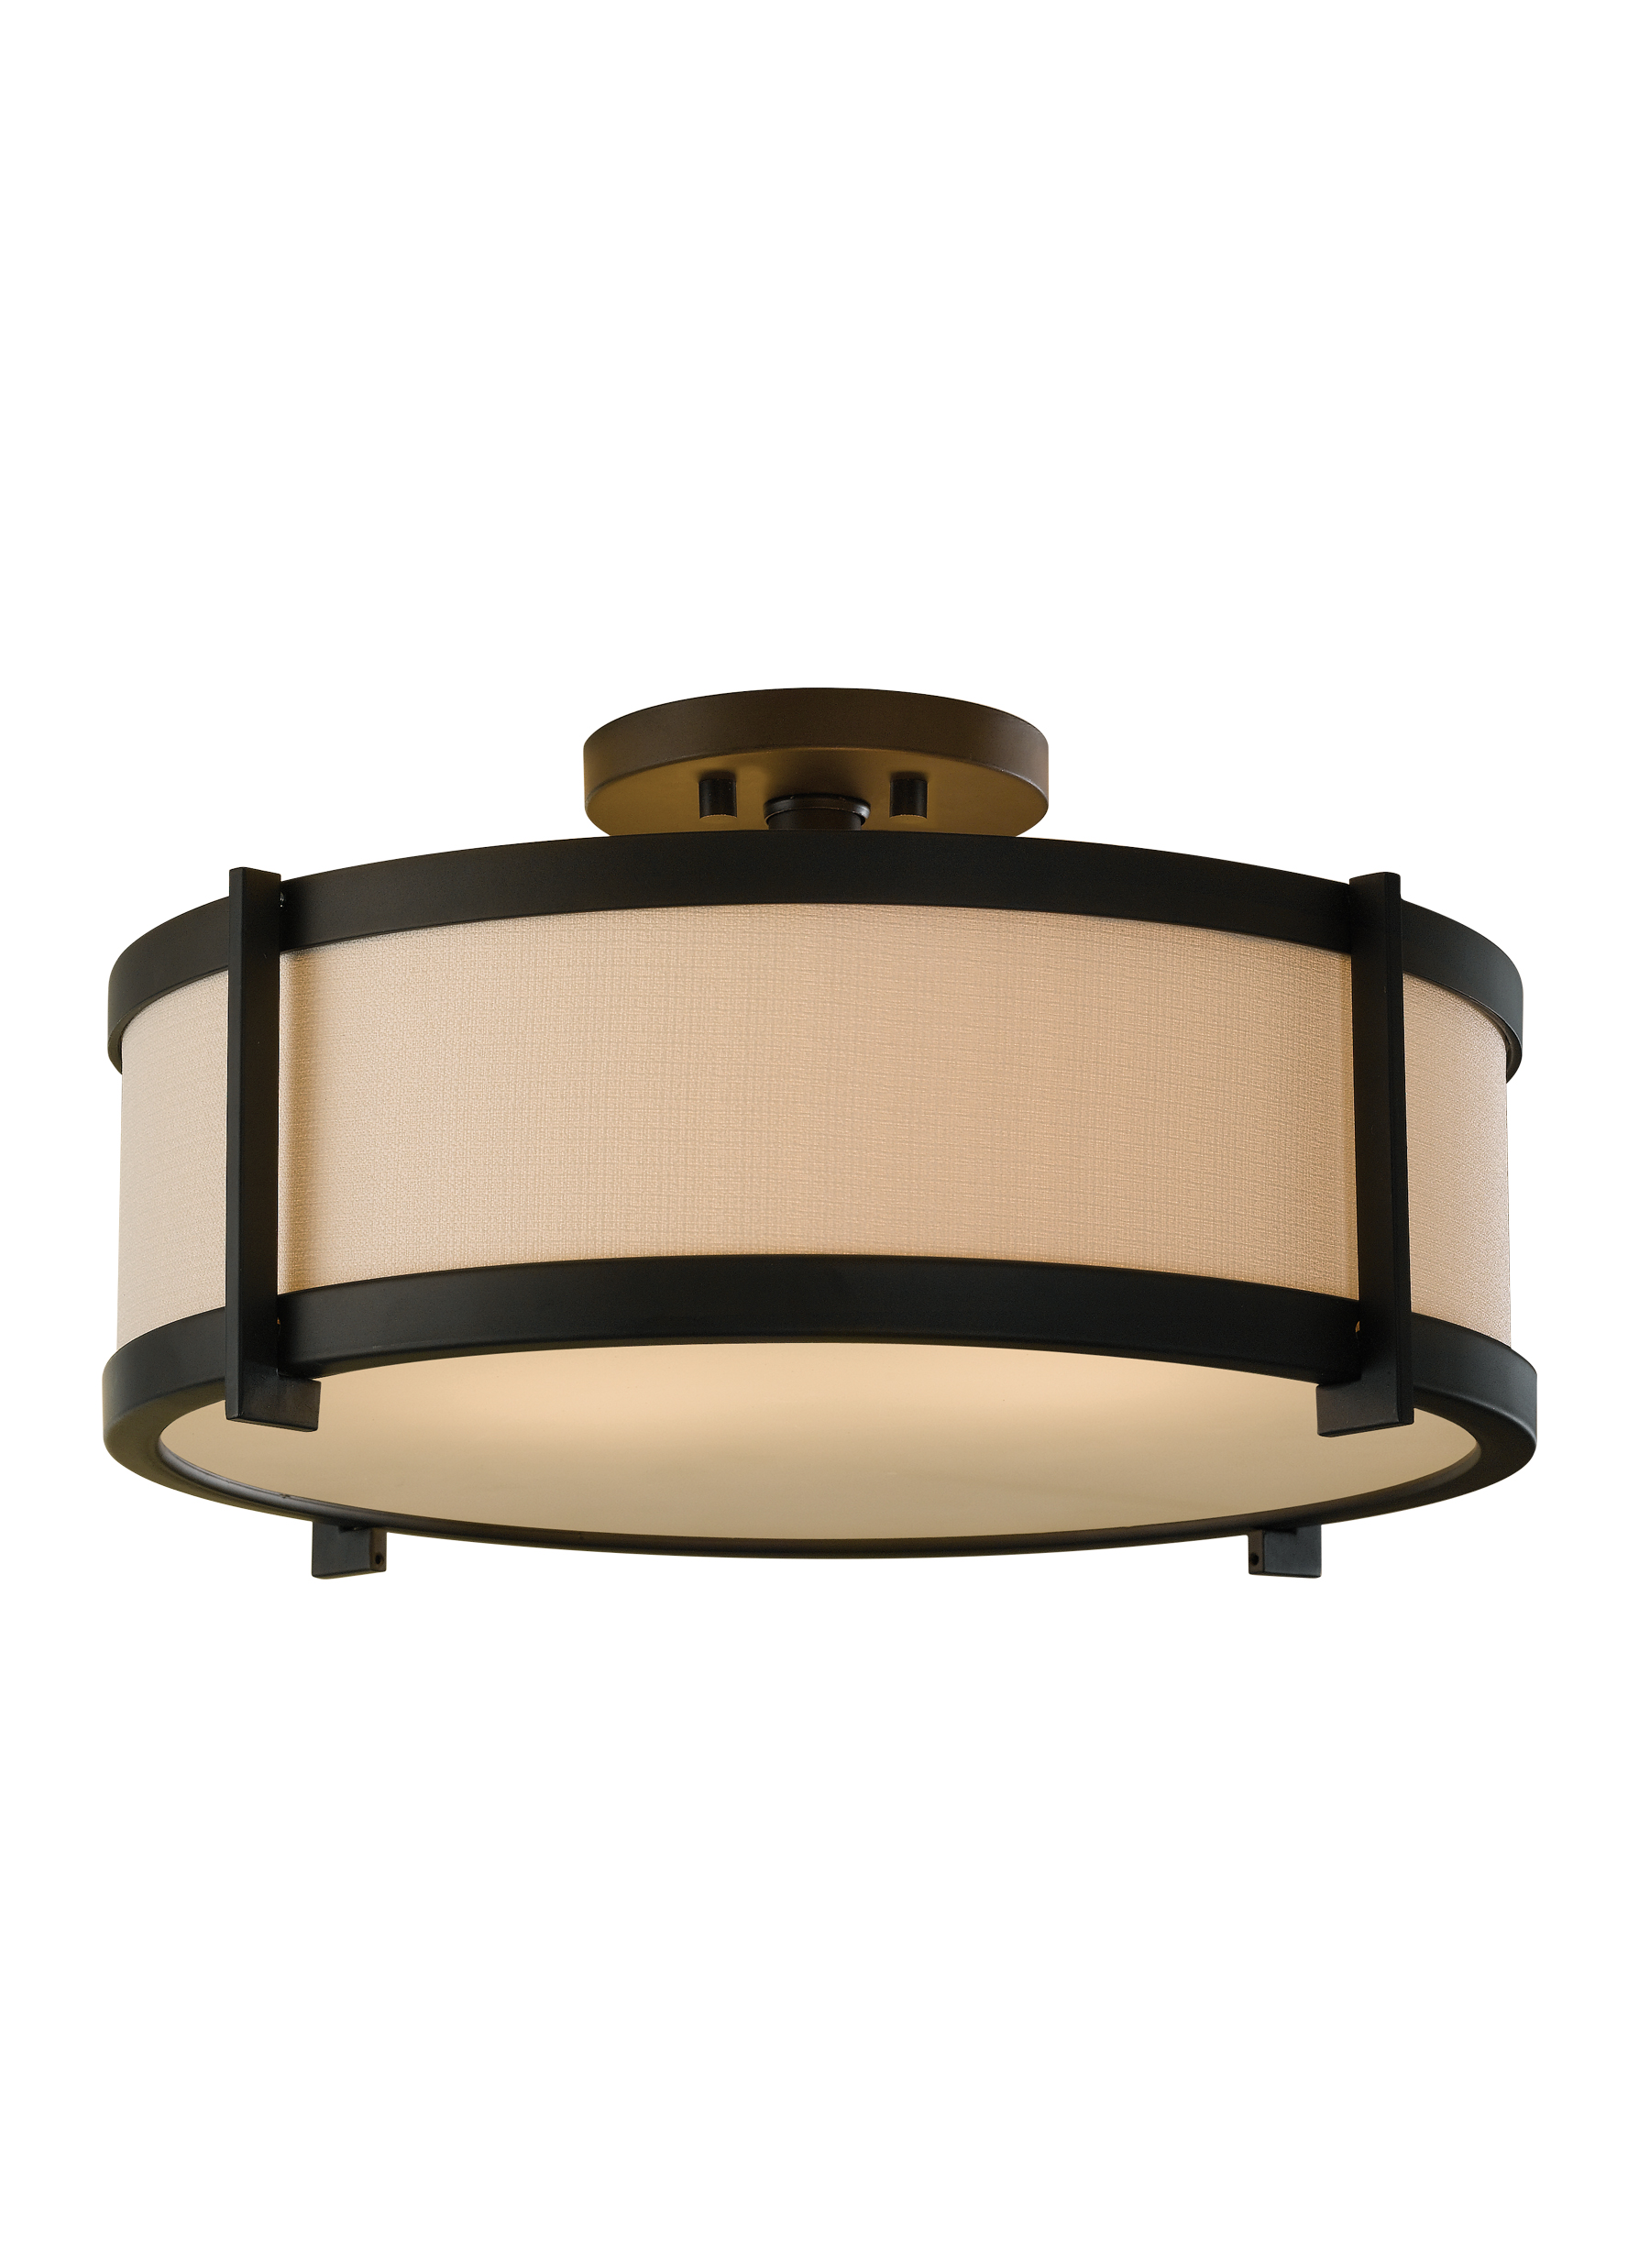 SF272ORB,2 - Light Indoor Semi-Flush Mount,Oil Rubbed Bronze